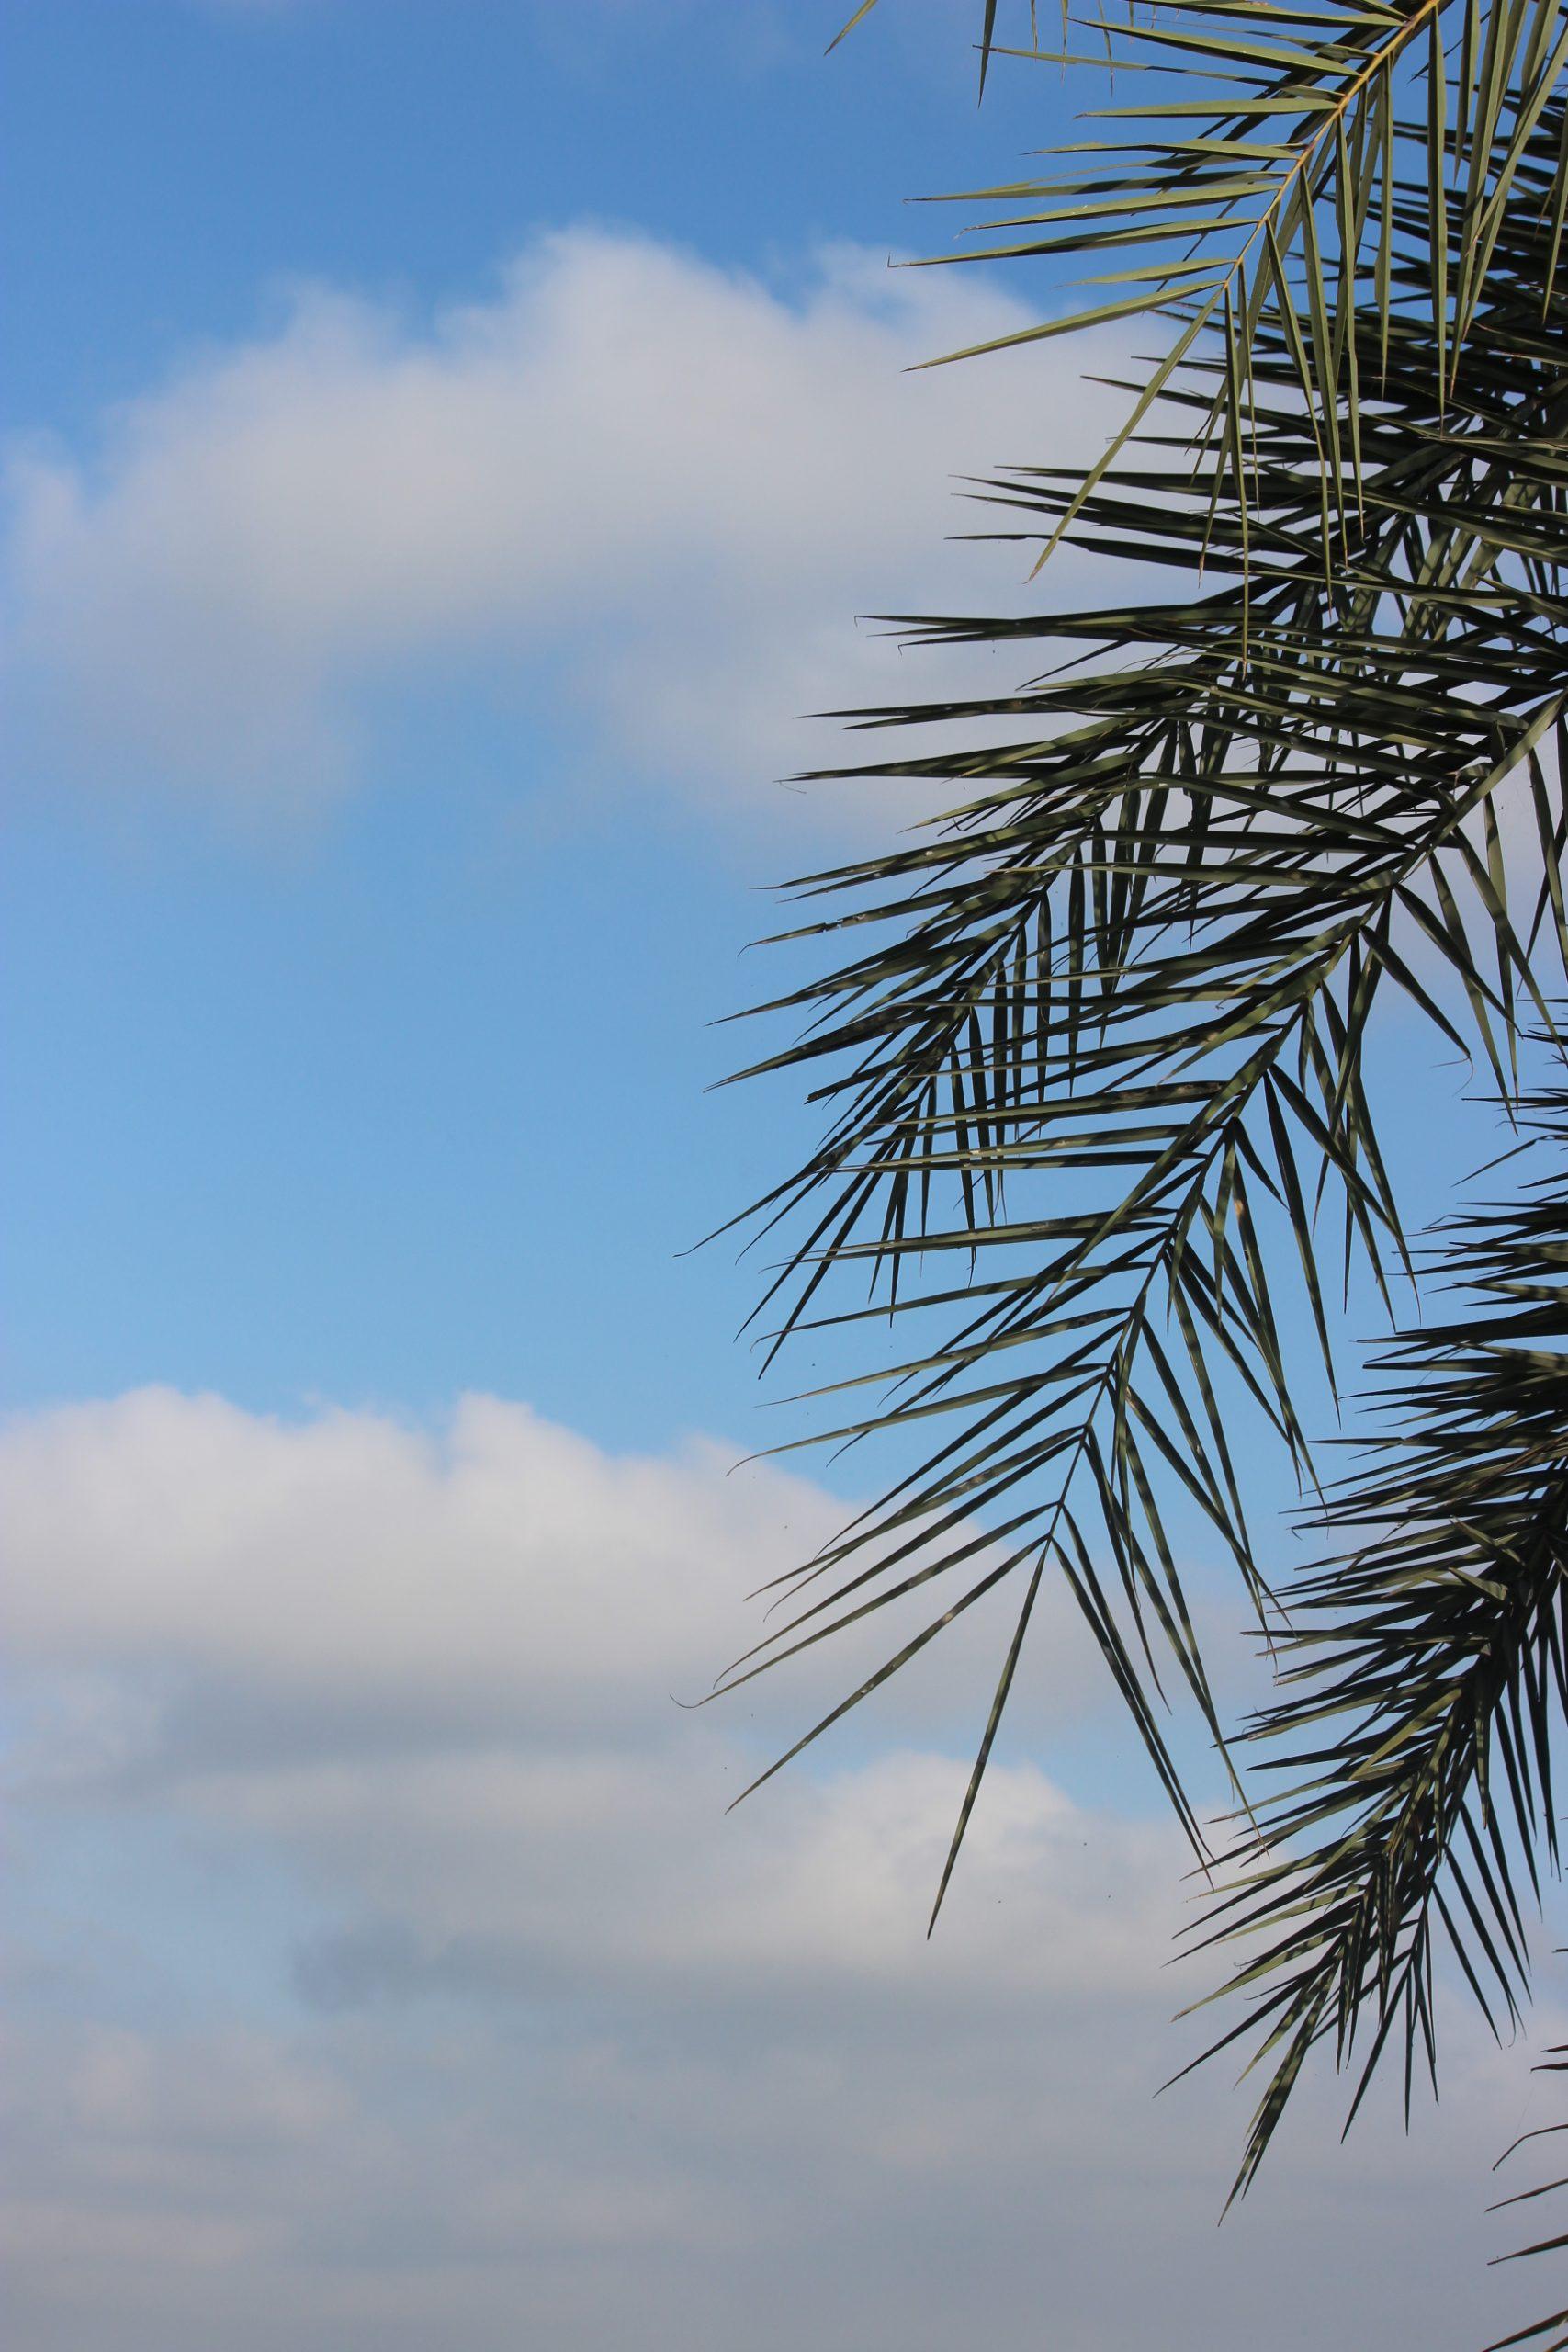 tree leaves against sky